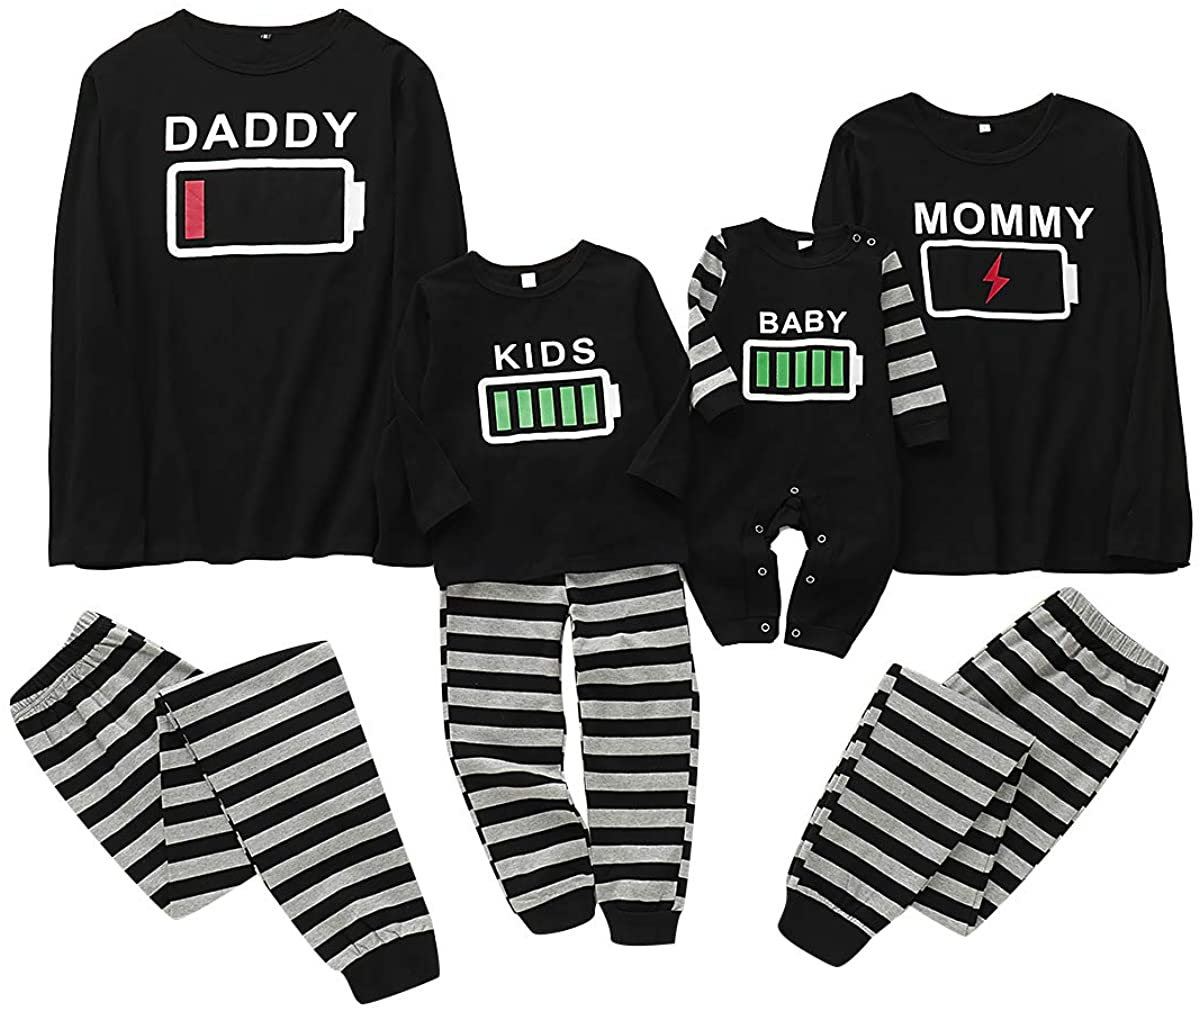 puseky Family Matching Clothes Pajamas Set Battery Print Nightwear Sleepwear for Dad Mom Kids Baby Black